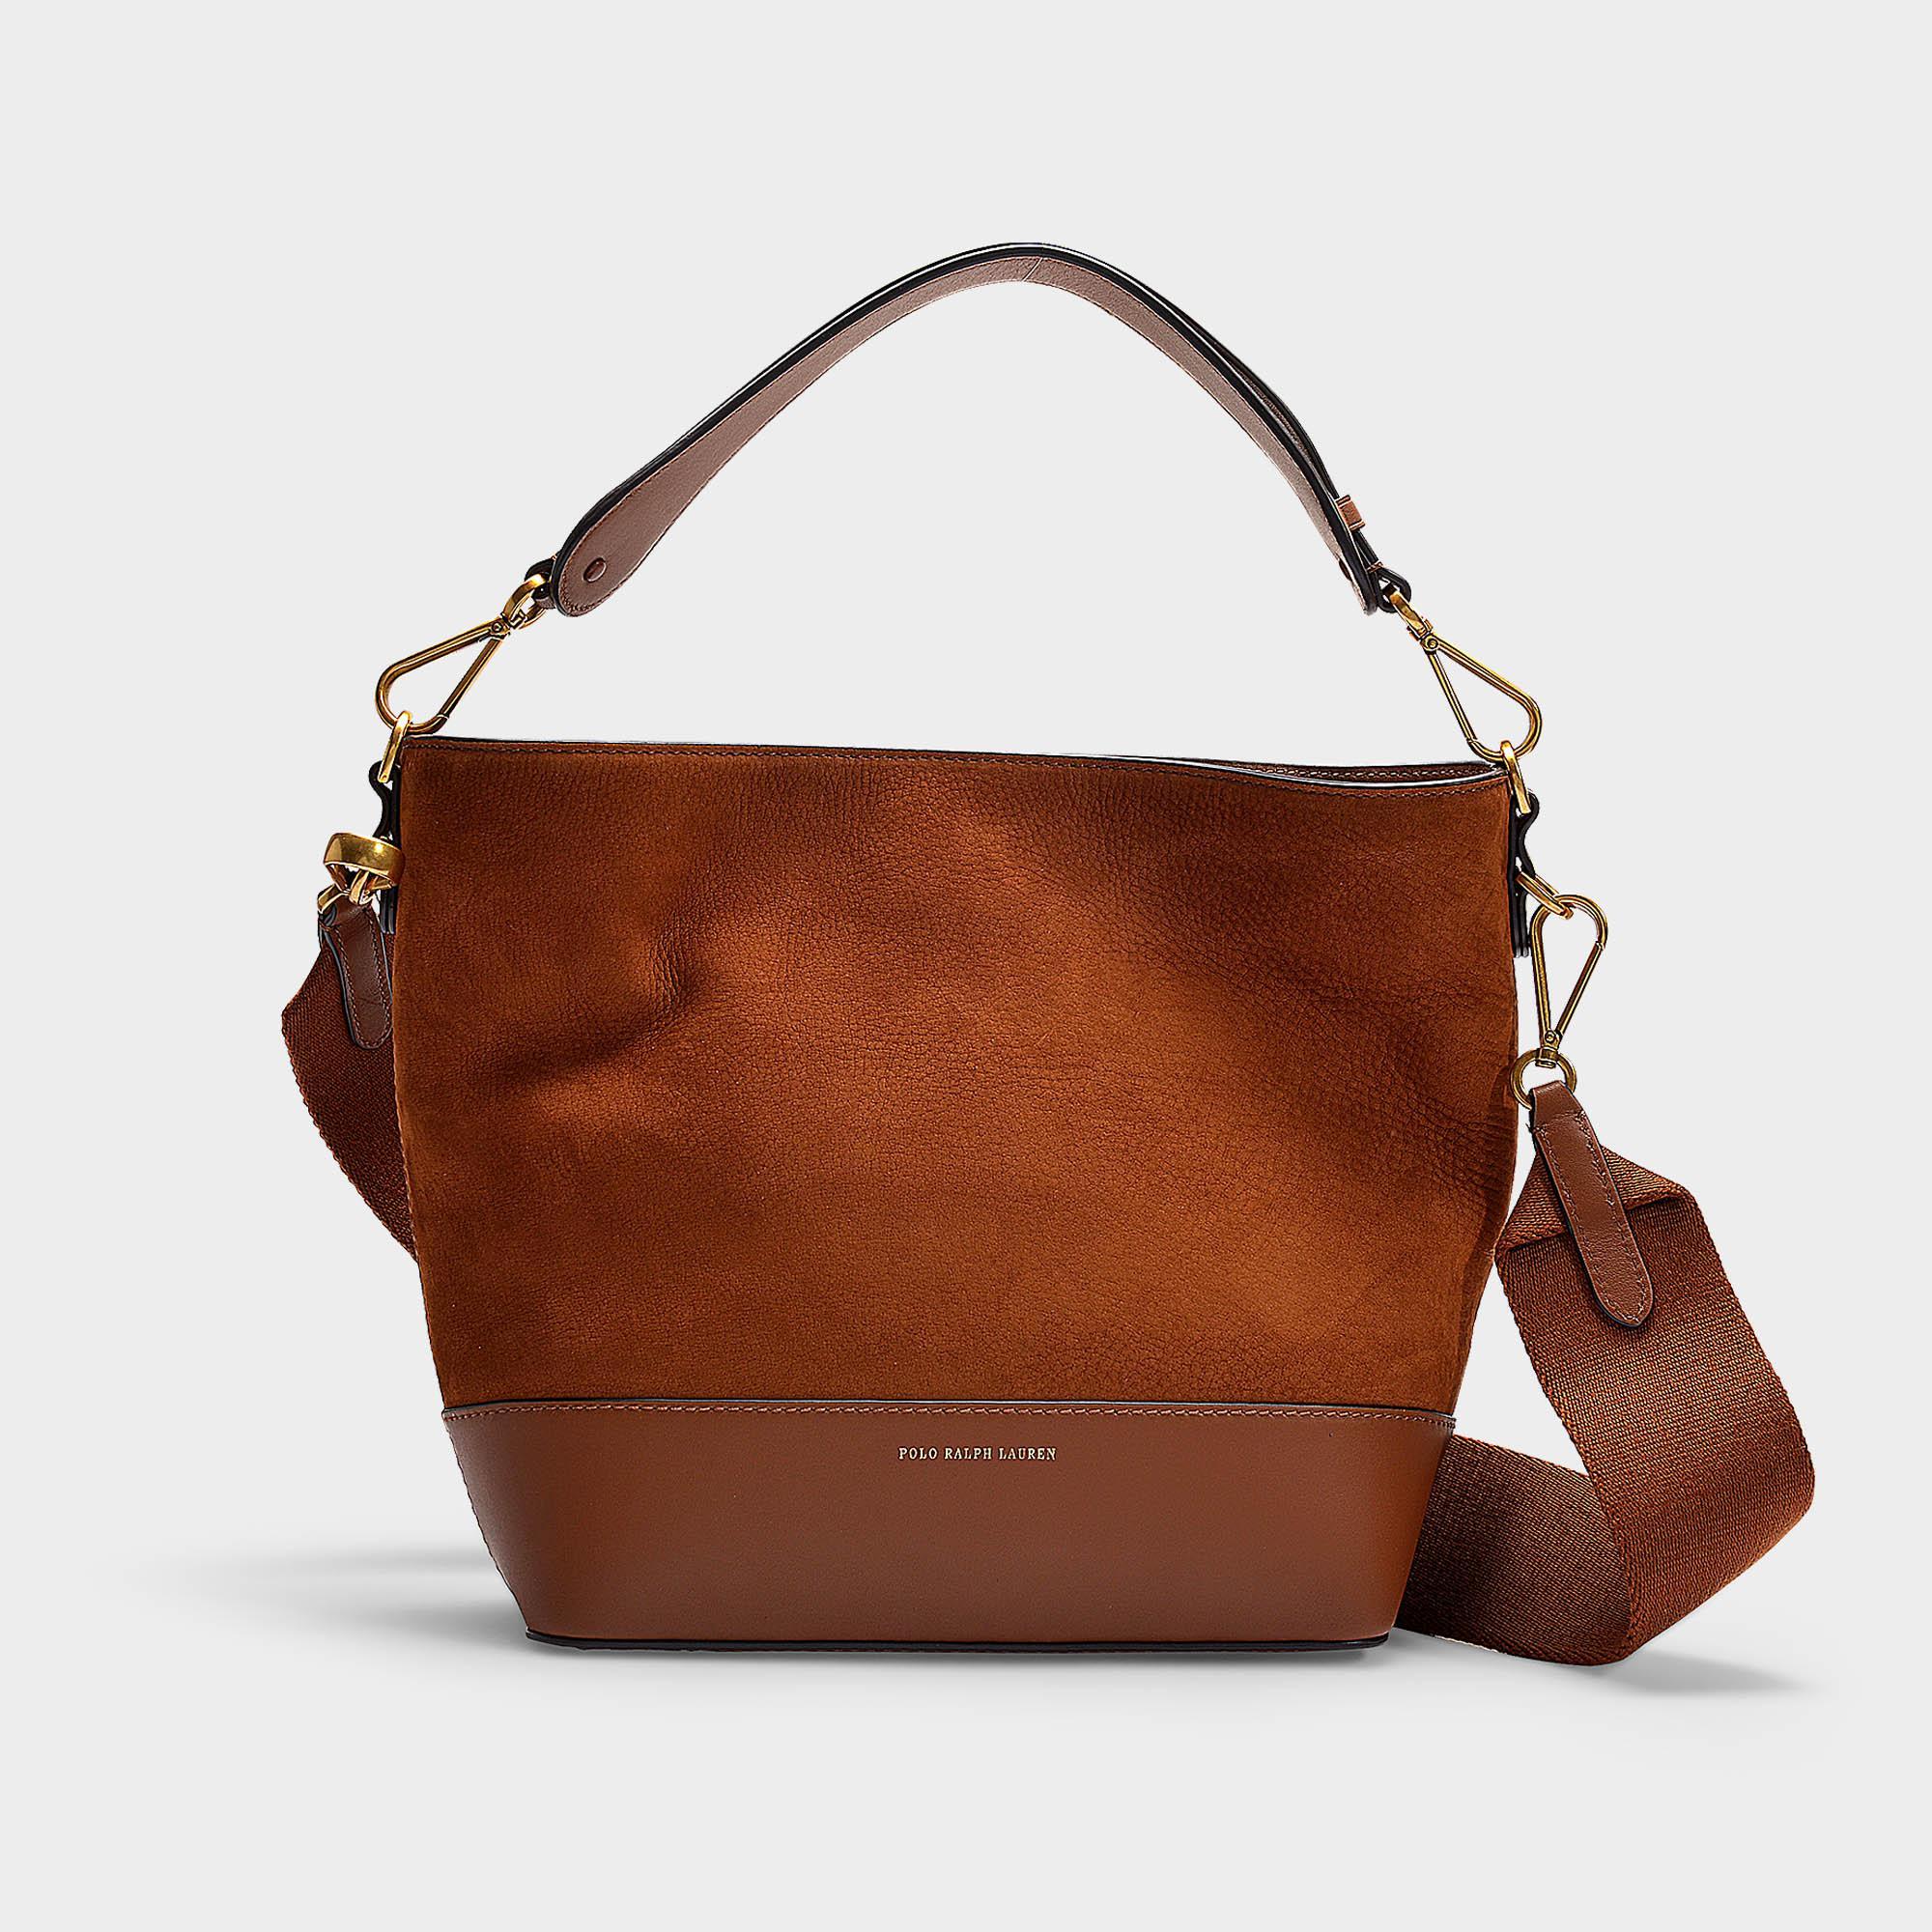 2501b013b01c Polo Ralph Lauren - Brown Sullivan Bucket Hobo Small Bag In Saddle Nubuck  And Nappa Leather. View fullscreen